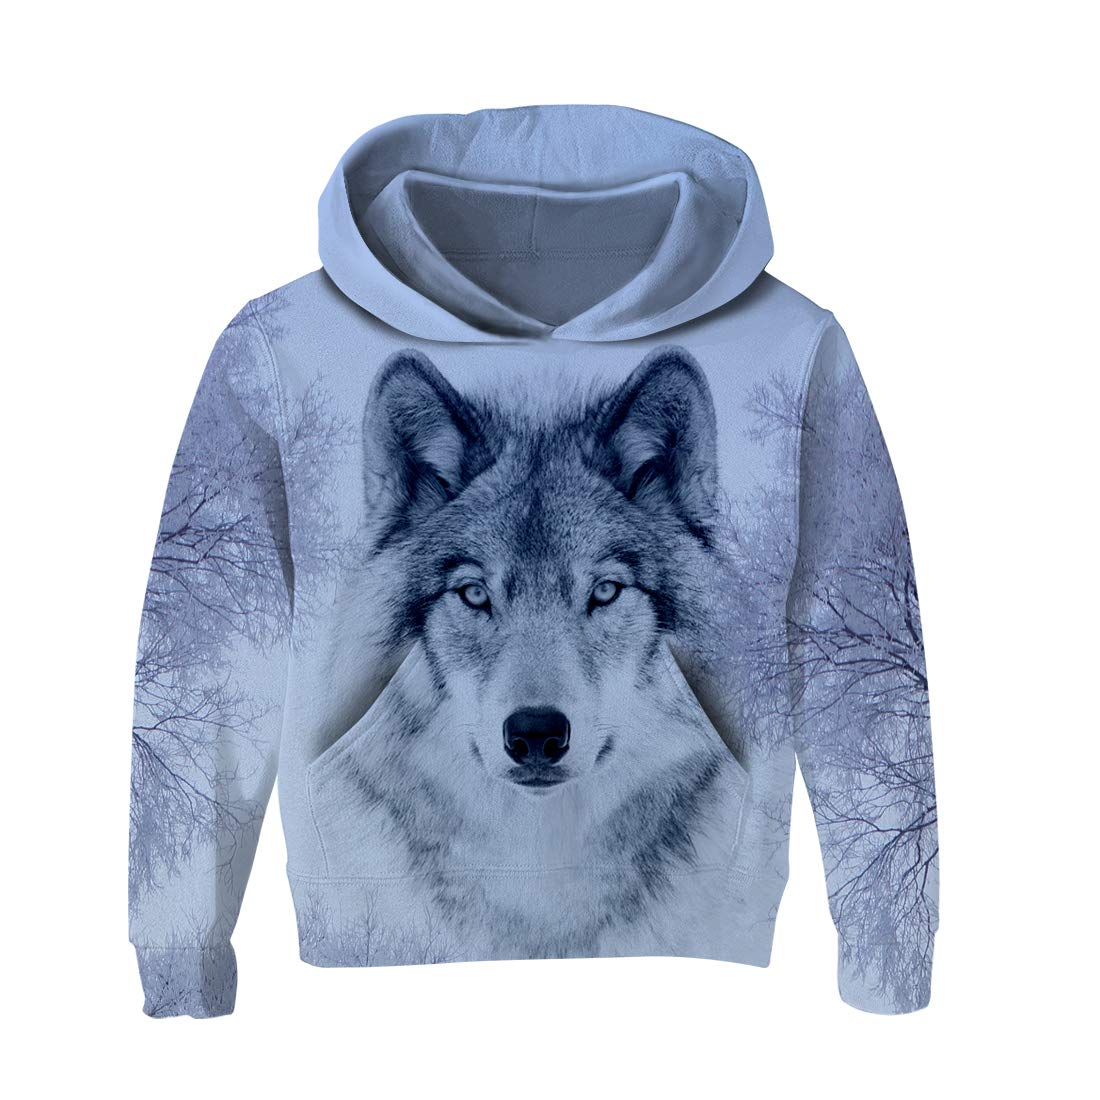 AIDEAONE Kids Boys Girls 3D Print Fleece Pullover Hoodies Sweatshirt with Kangaroo Pocket